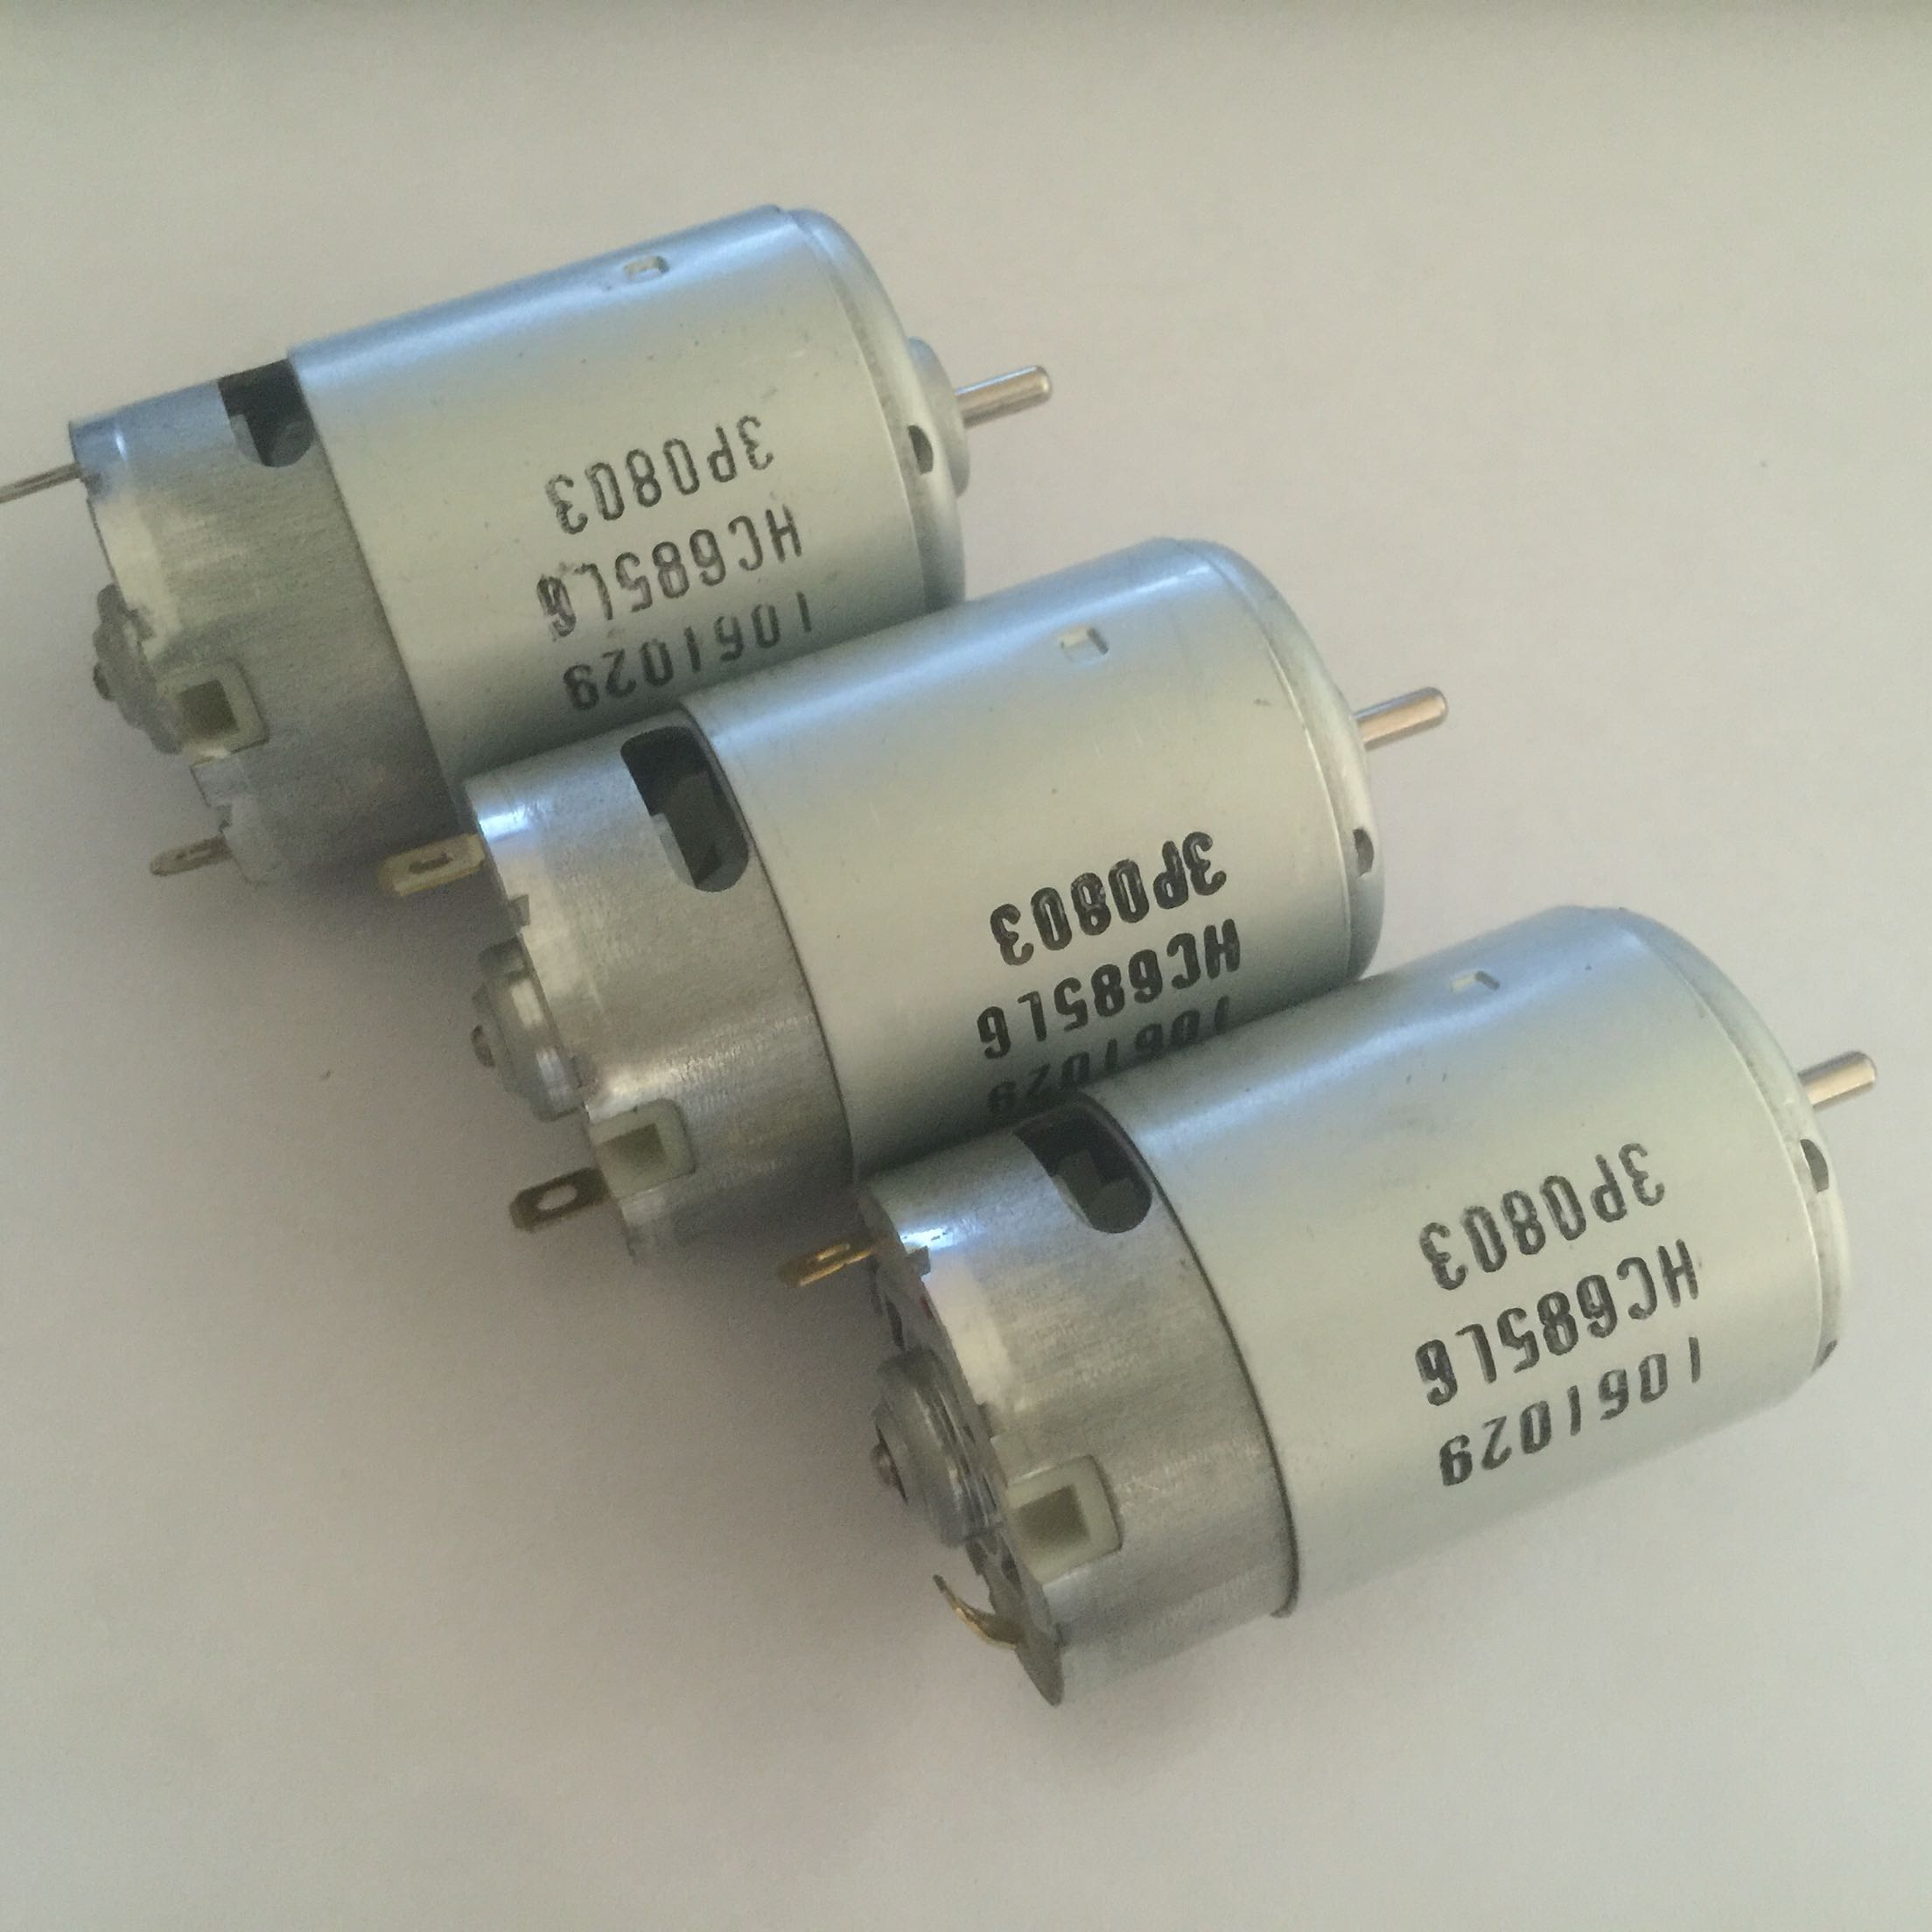 550 para motor johnson, 12V-18V para worx, herramienta eléctrica, motor, bomba de aire, modelo de motor